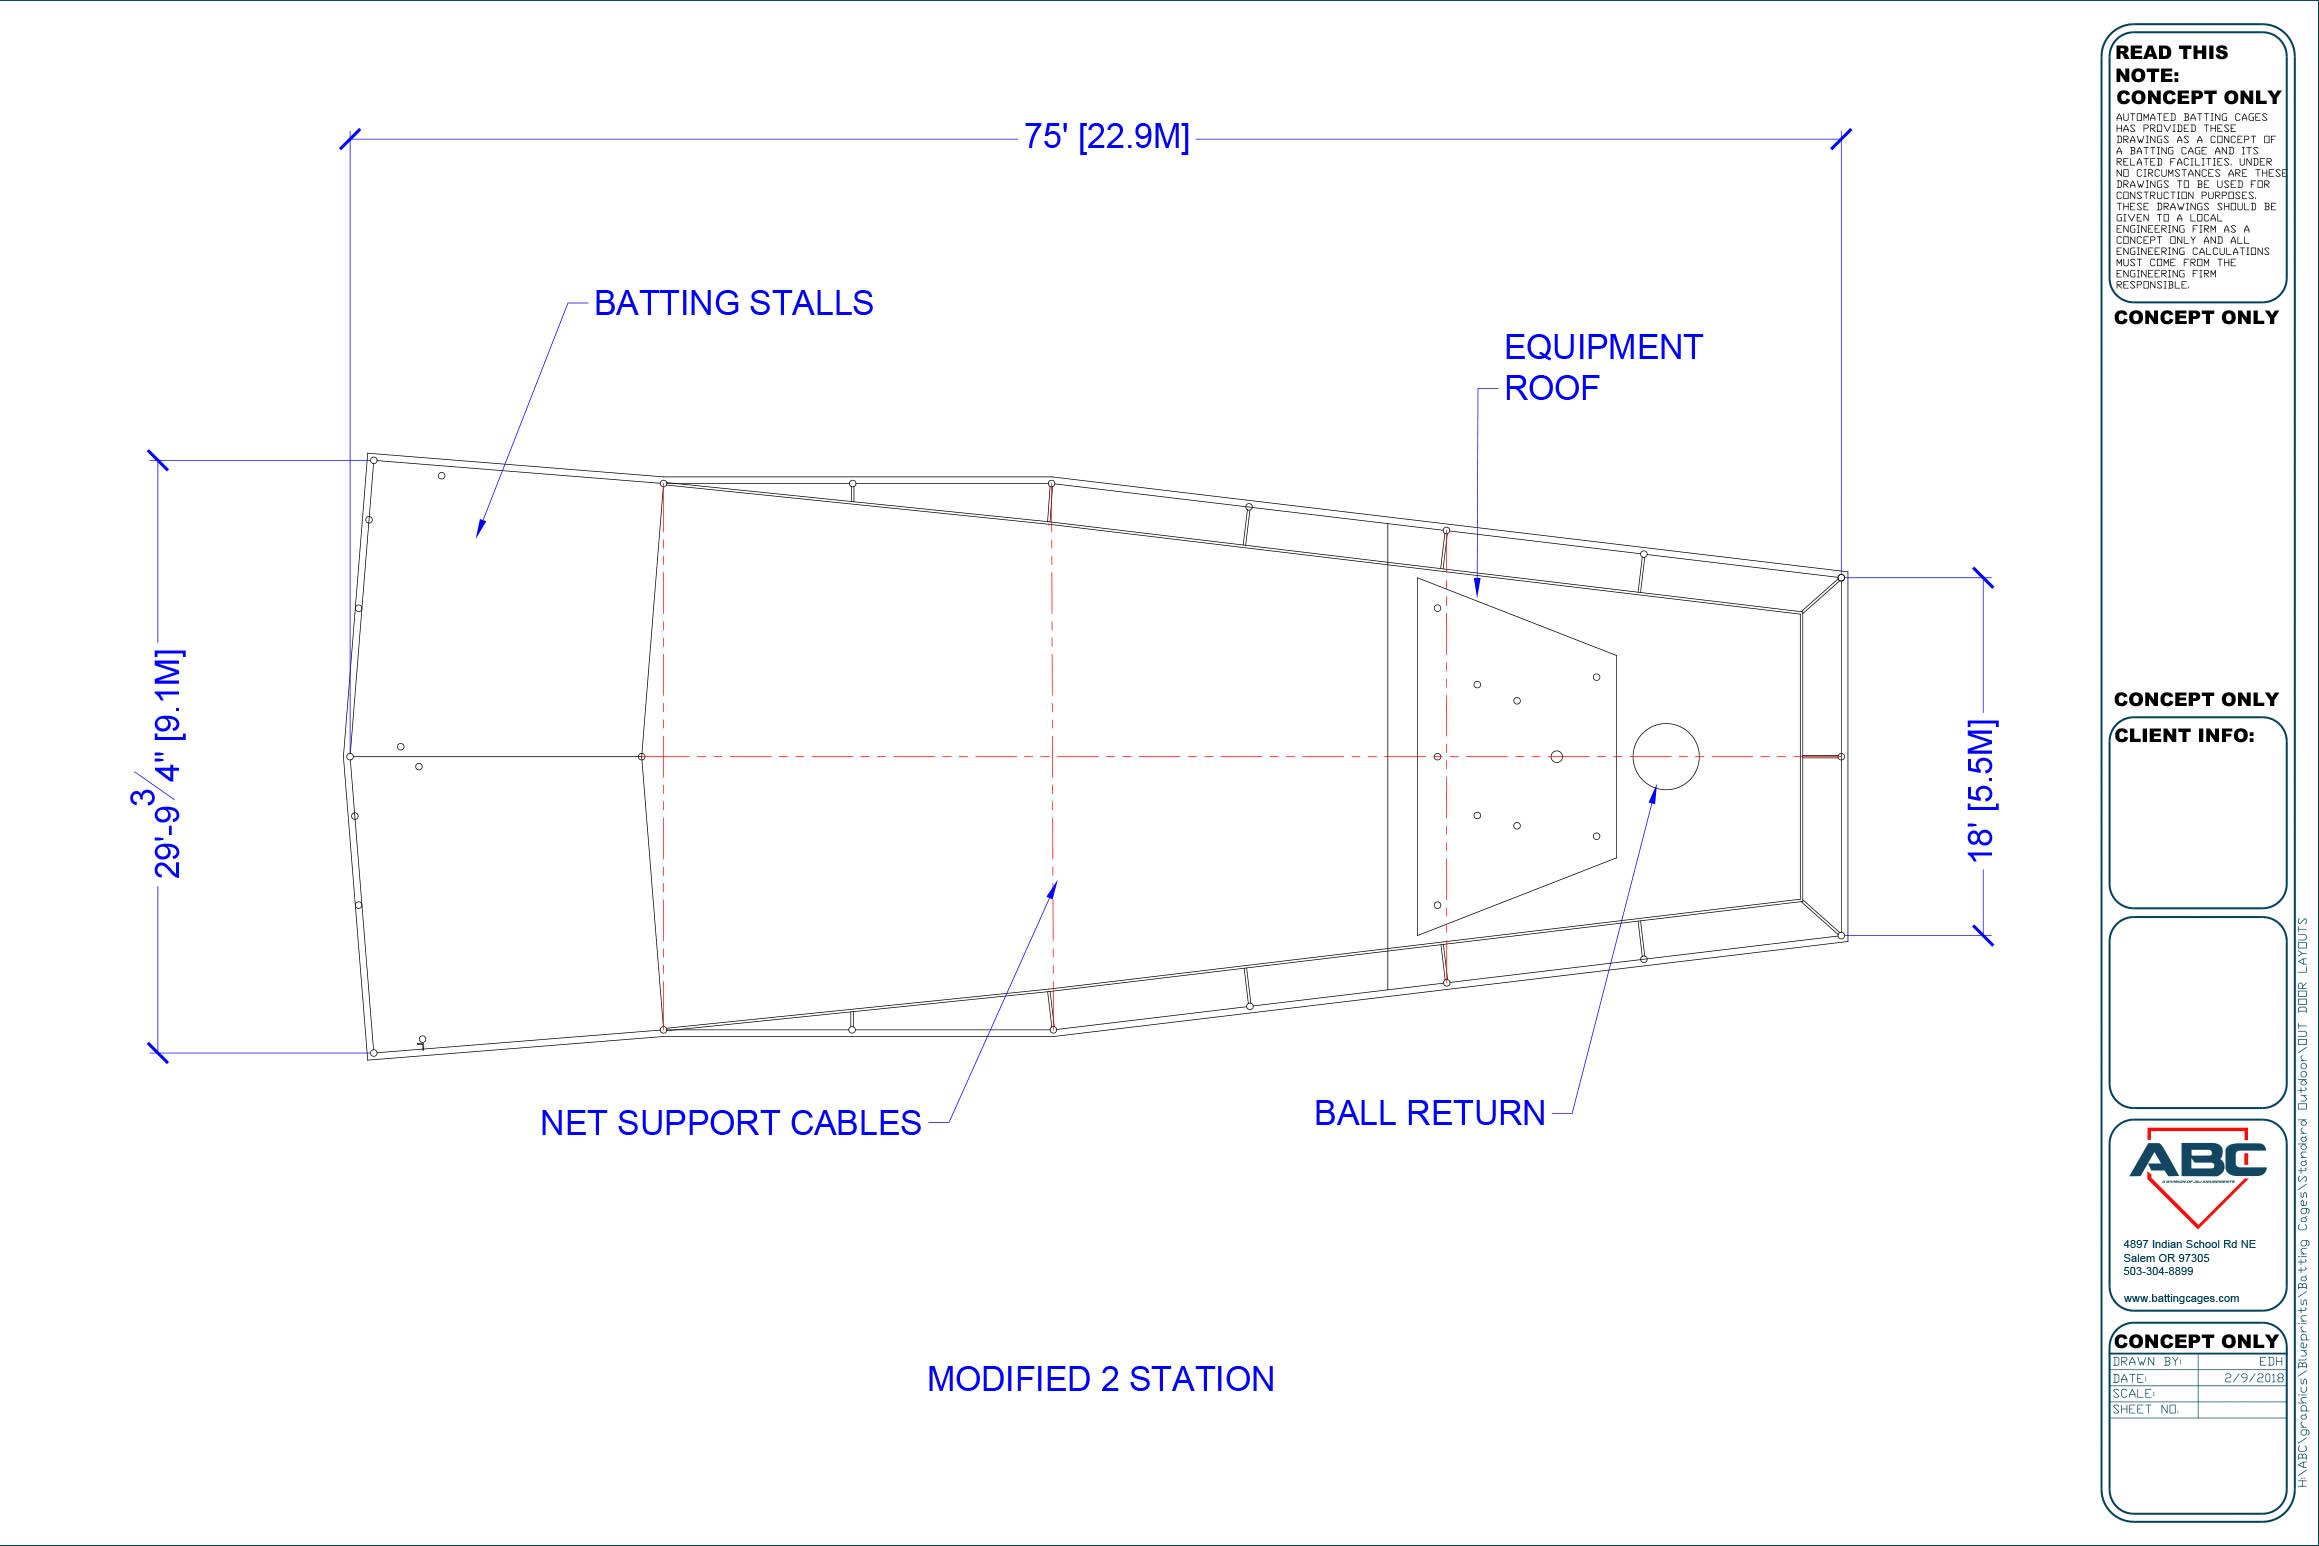 ABC modified 2 station blueprint